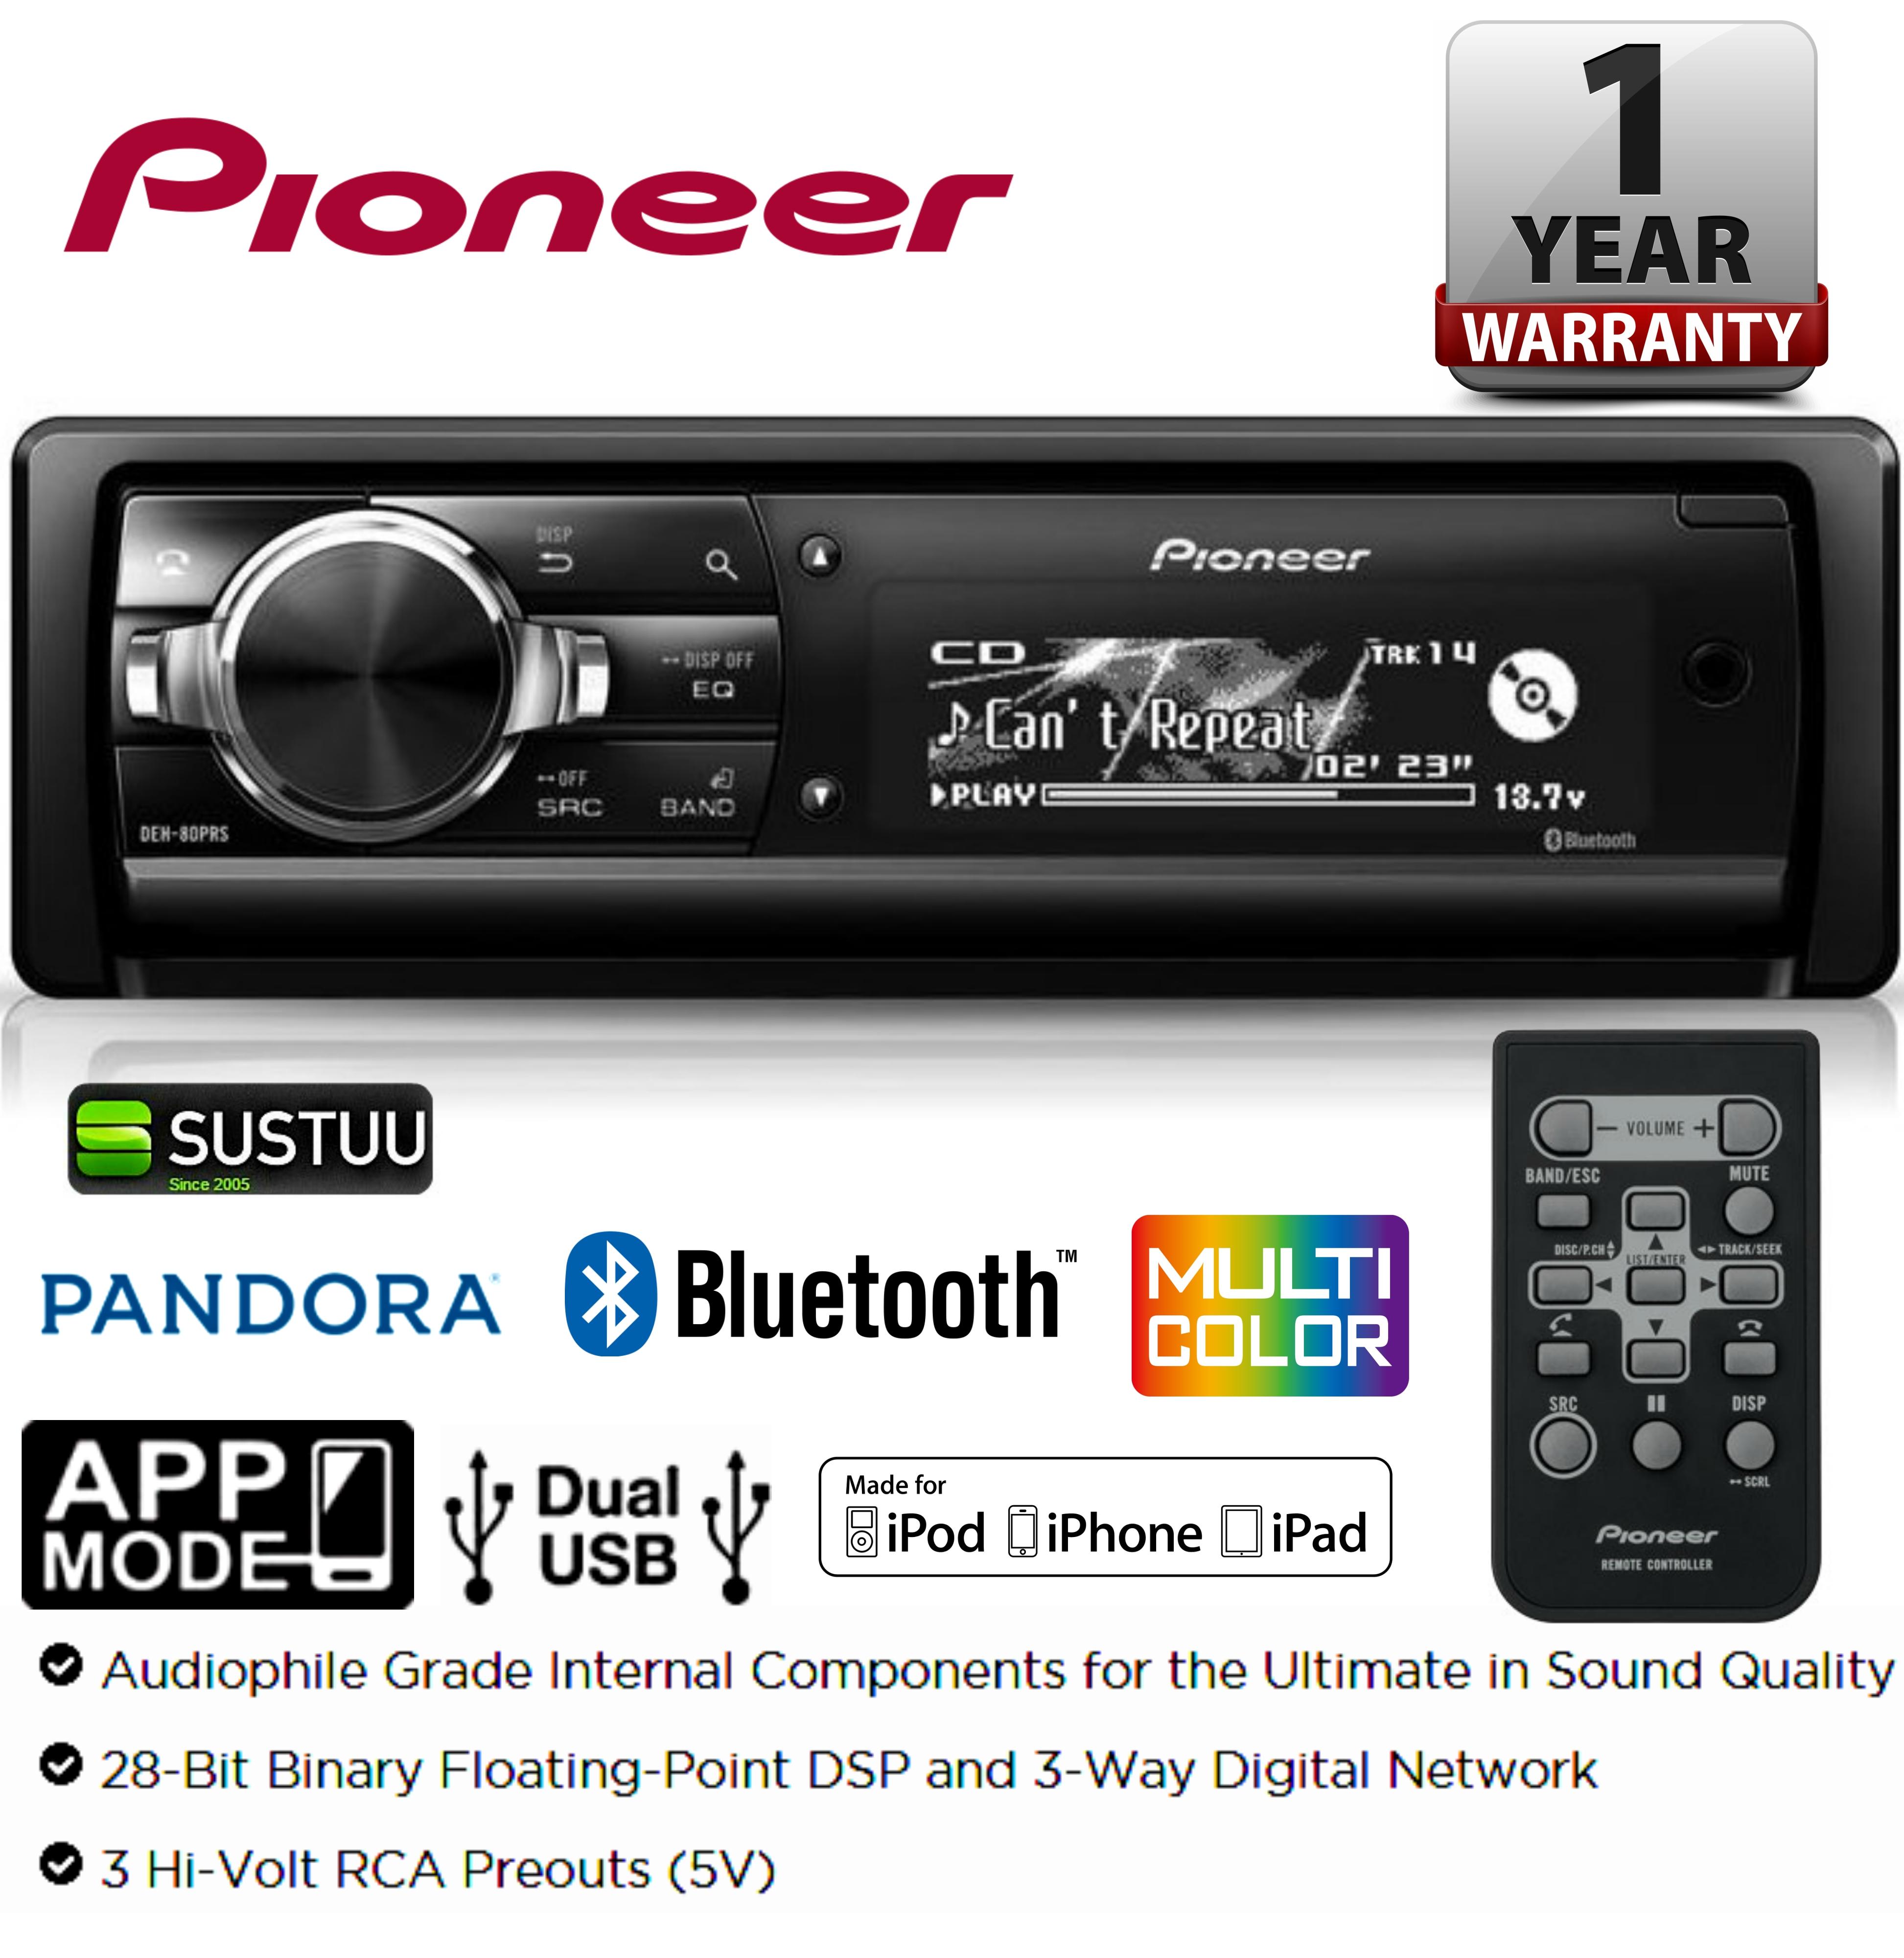 pioneer deh 80prs cd mp3 car stereo dual usb aux bluetooth. Black Bedroom Furniture Sets. Home Design Ideas